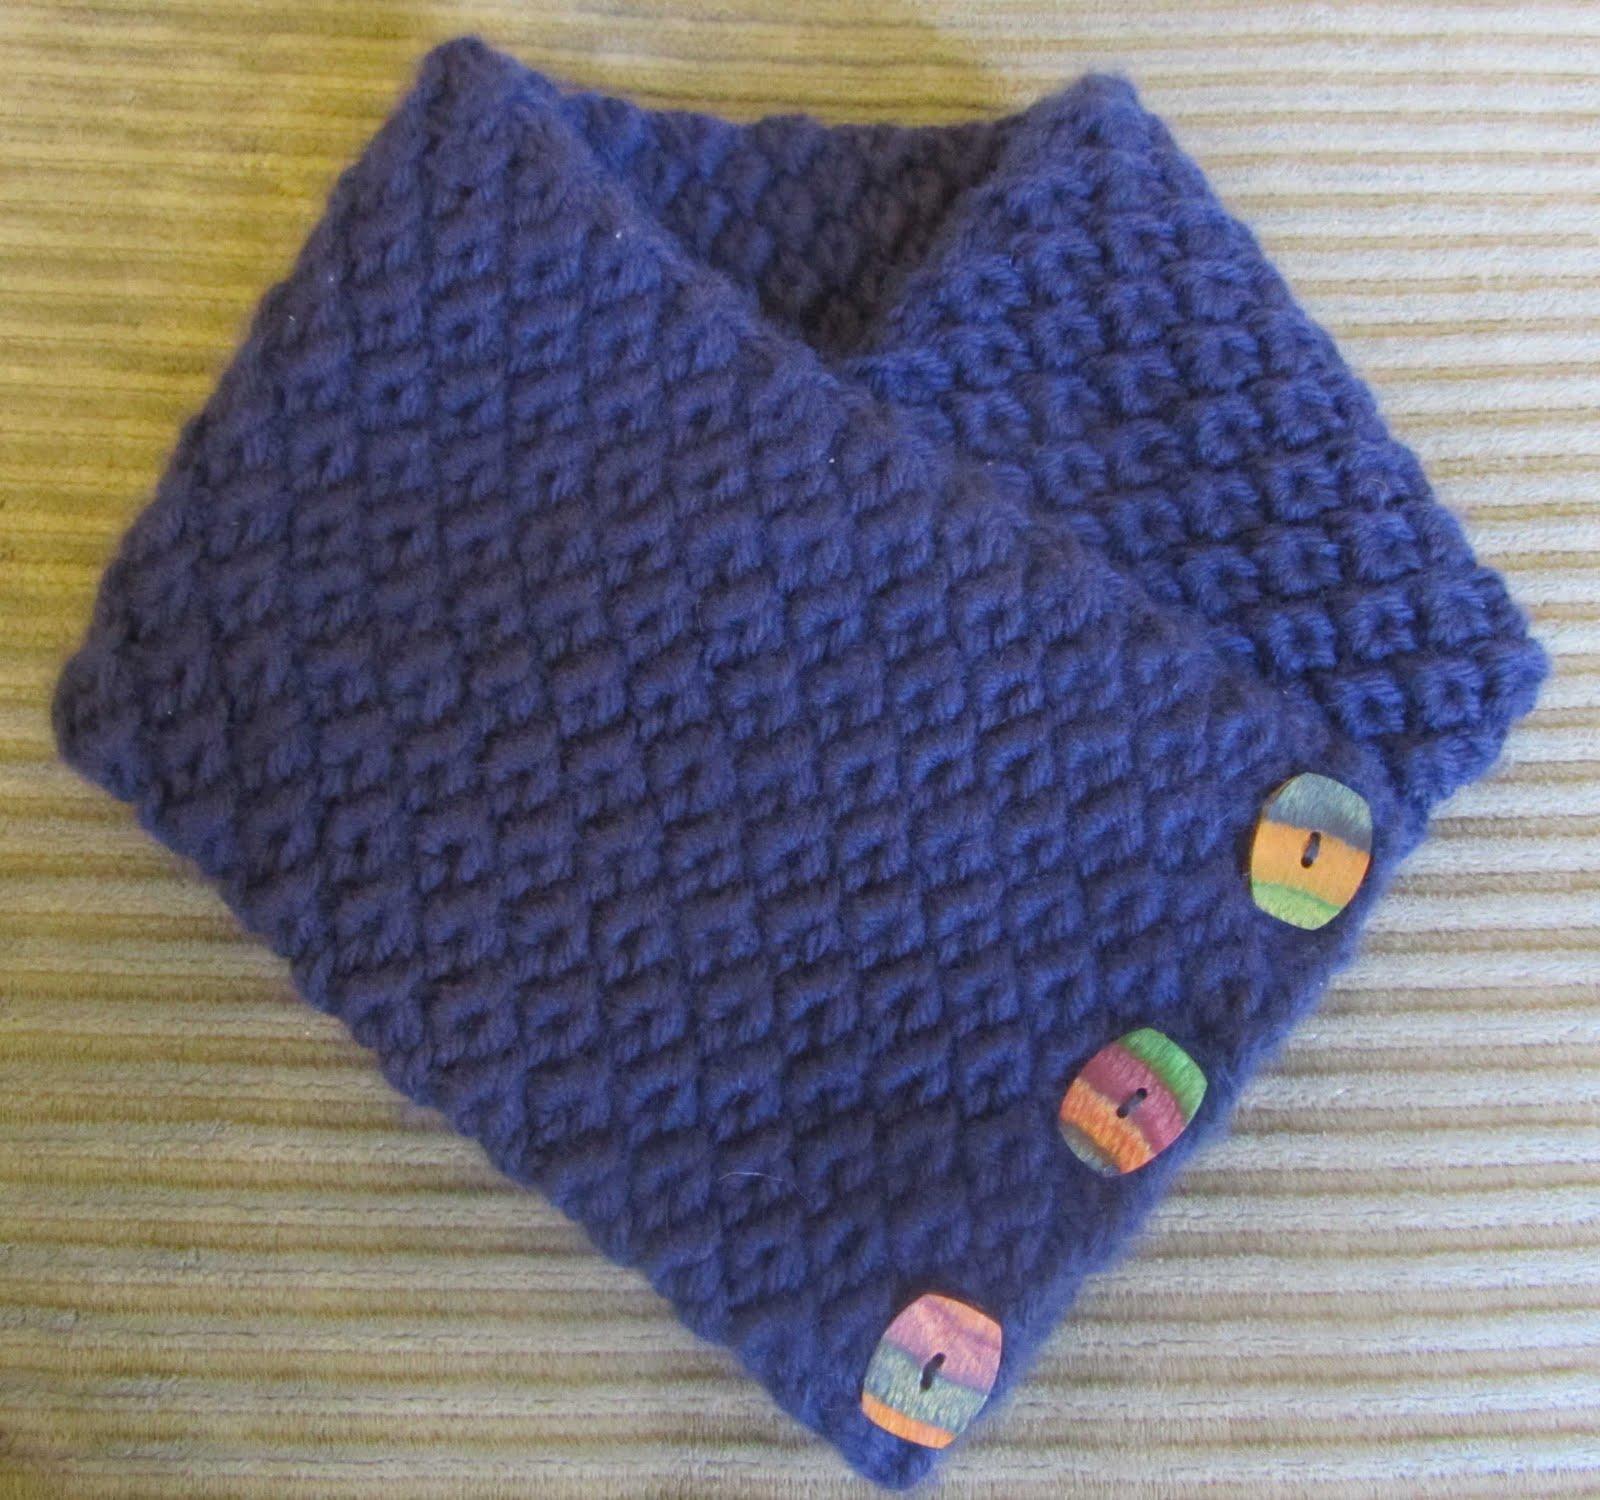 ChemKnits: Anemone Coat Check Scarf Knitting Pattern